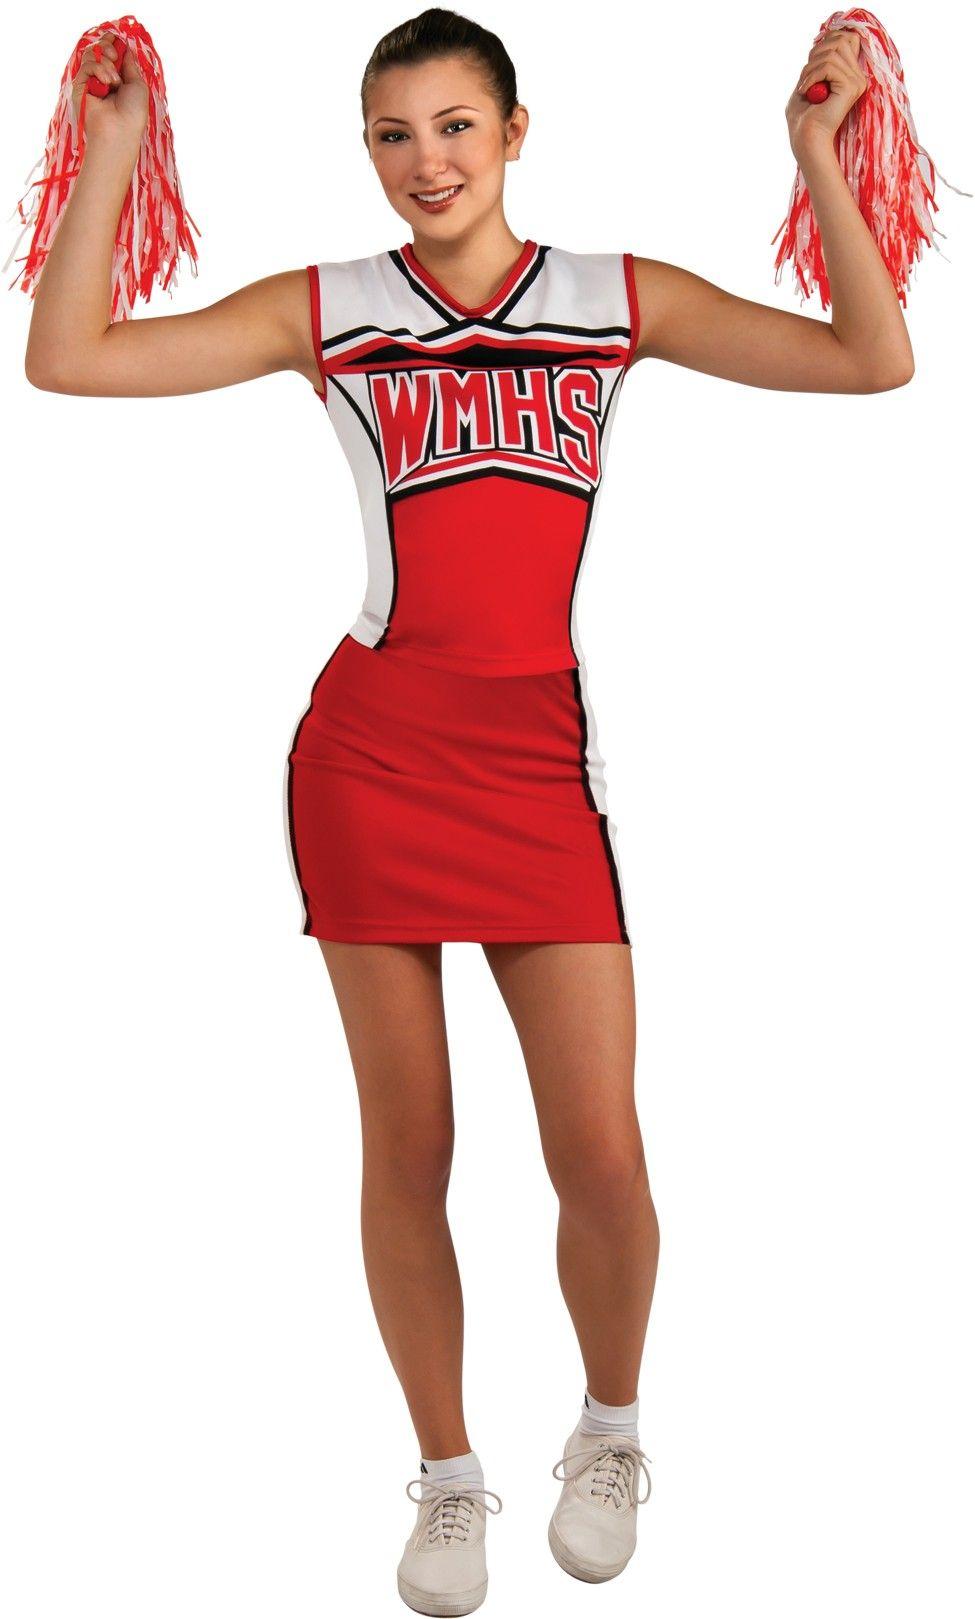 glee cheerleader teen girls costume - Teenage Girls Halloween Costume